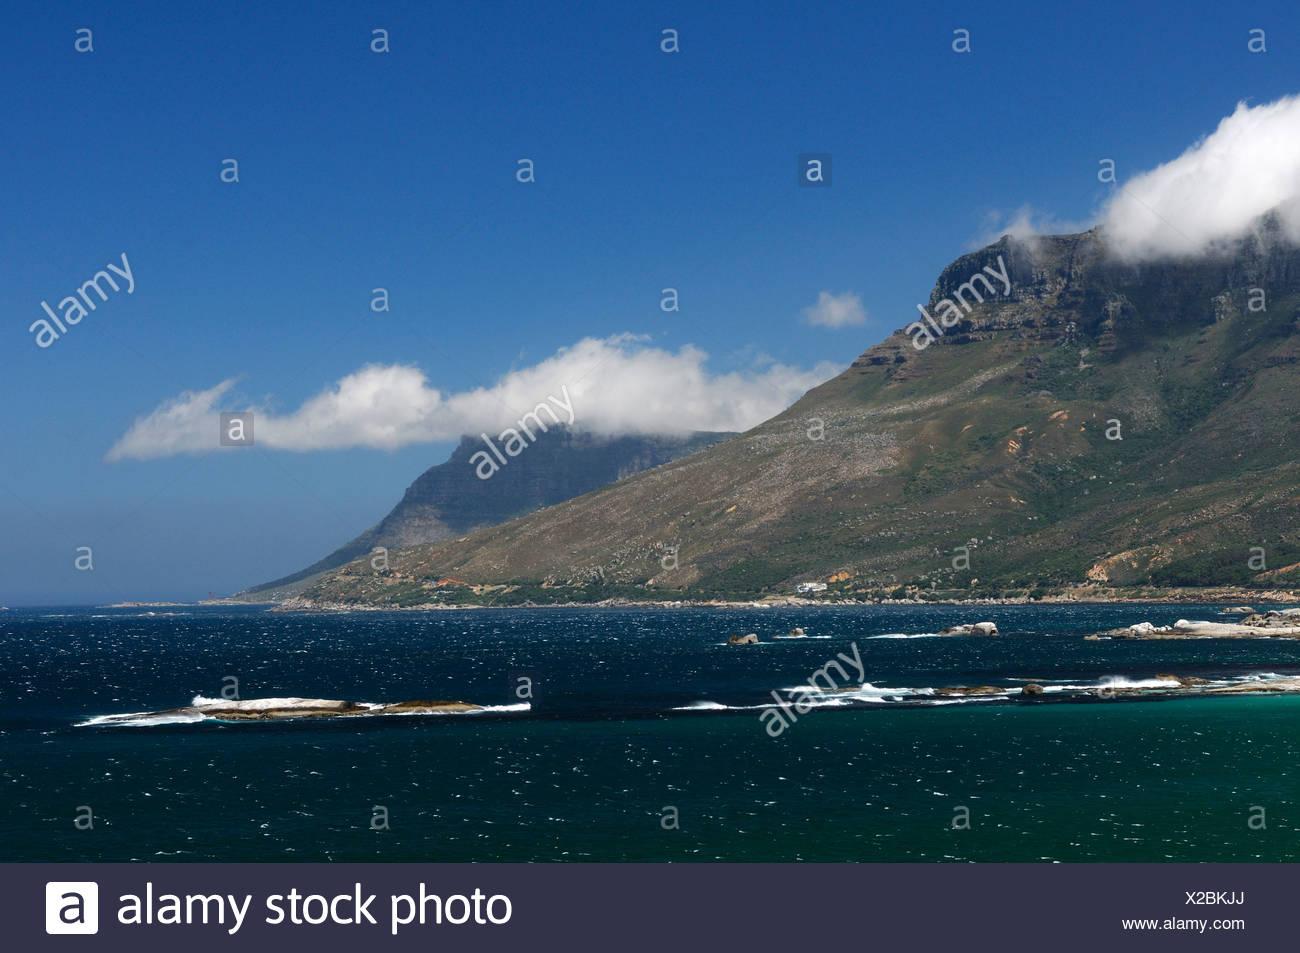 Twelve Apostles Mountains Camps Bay Cape Peninsula Western Cape South Africa fog clouds shore coast sea ocean houses scenery - Stock Image